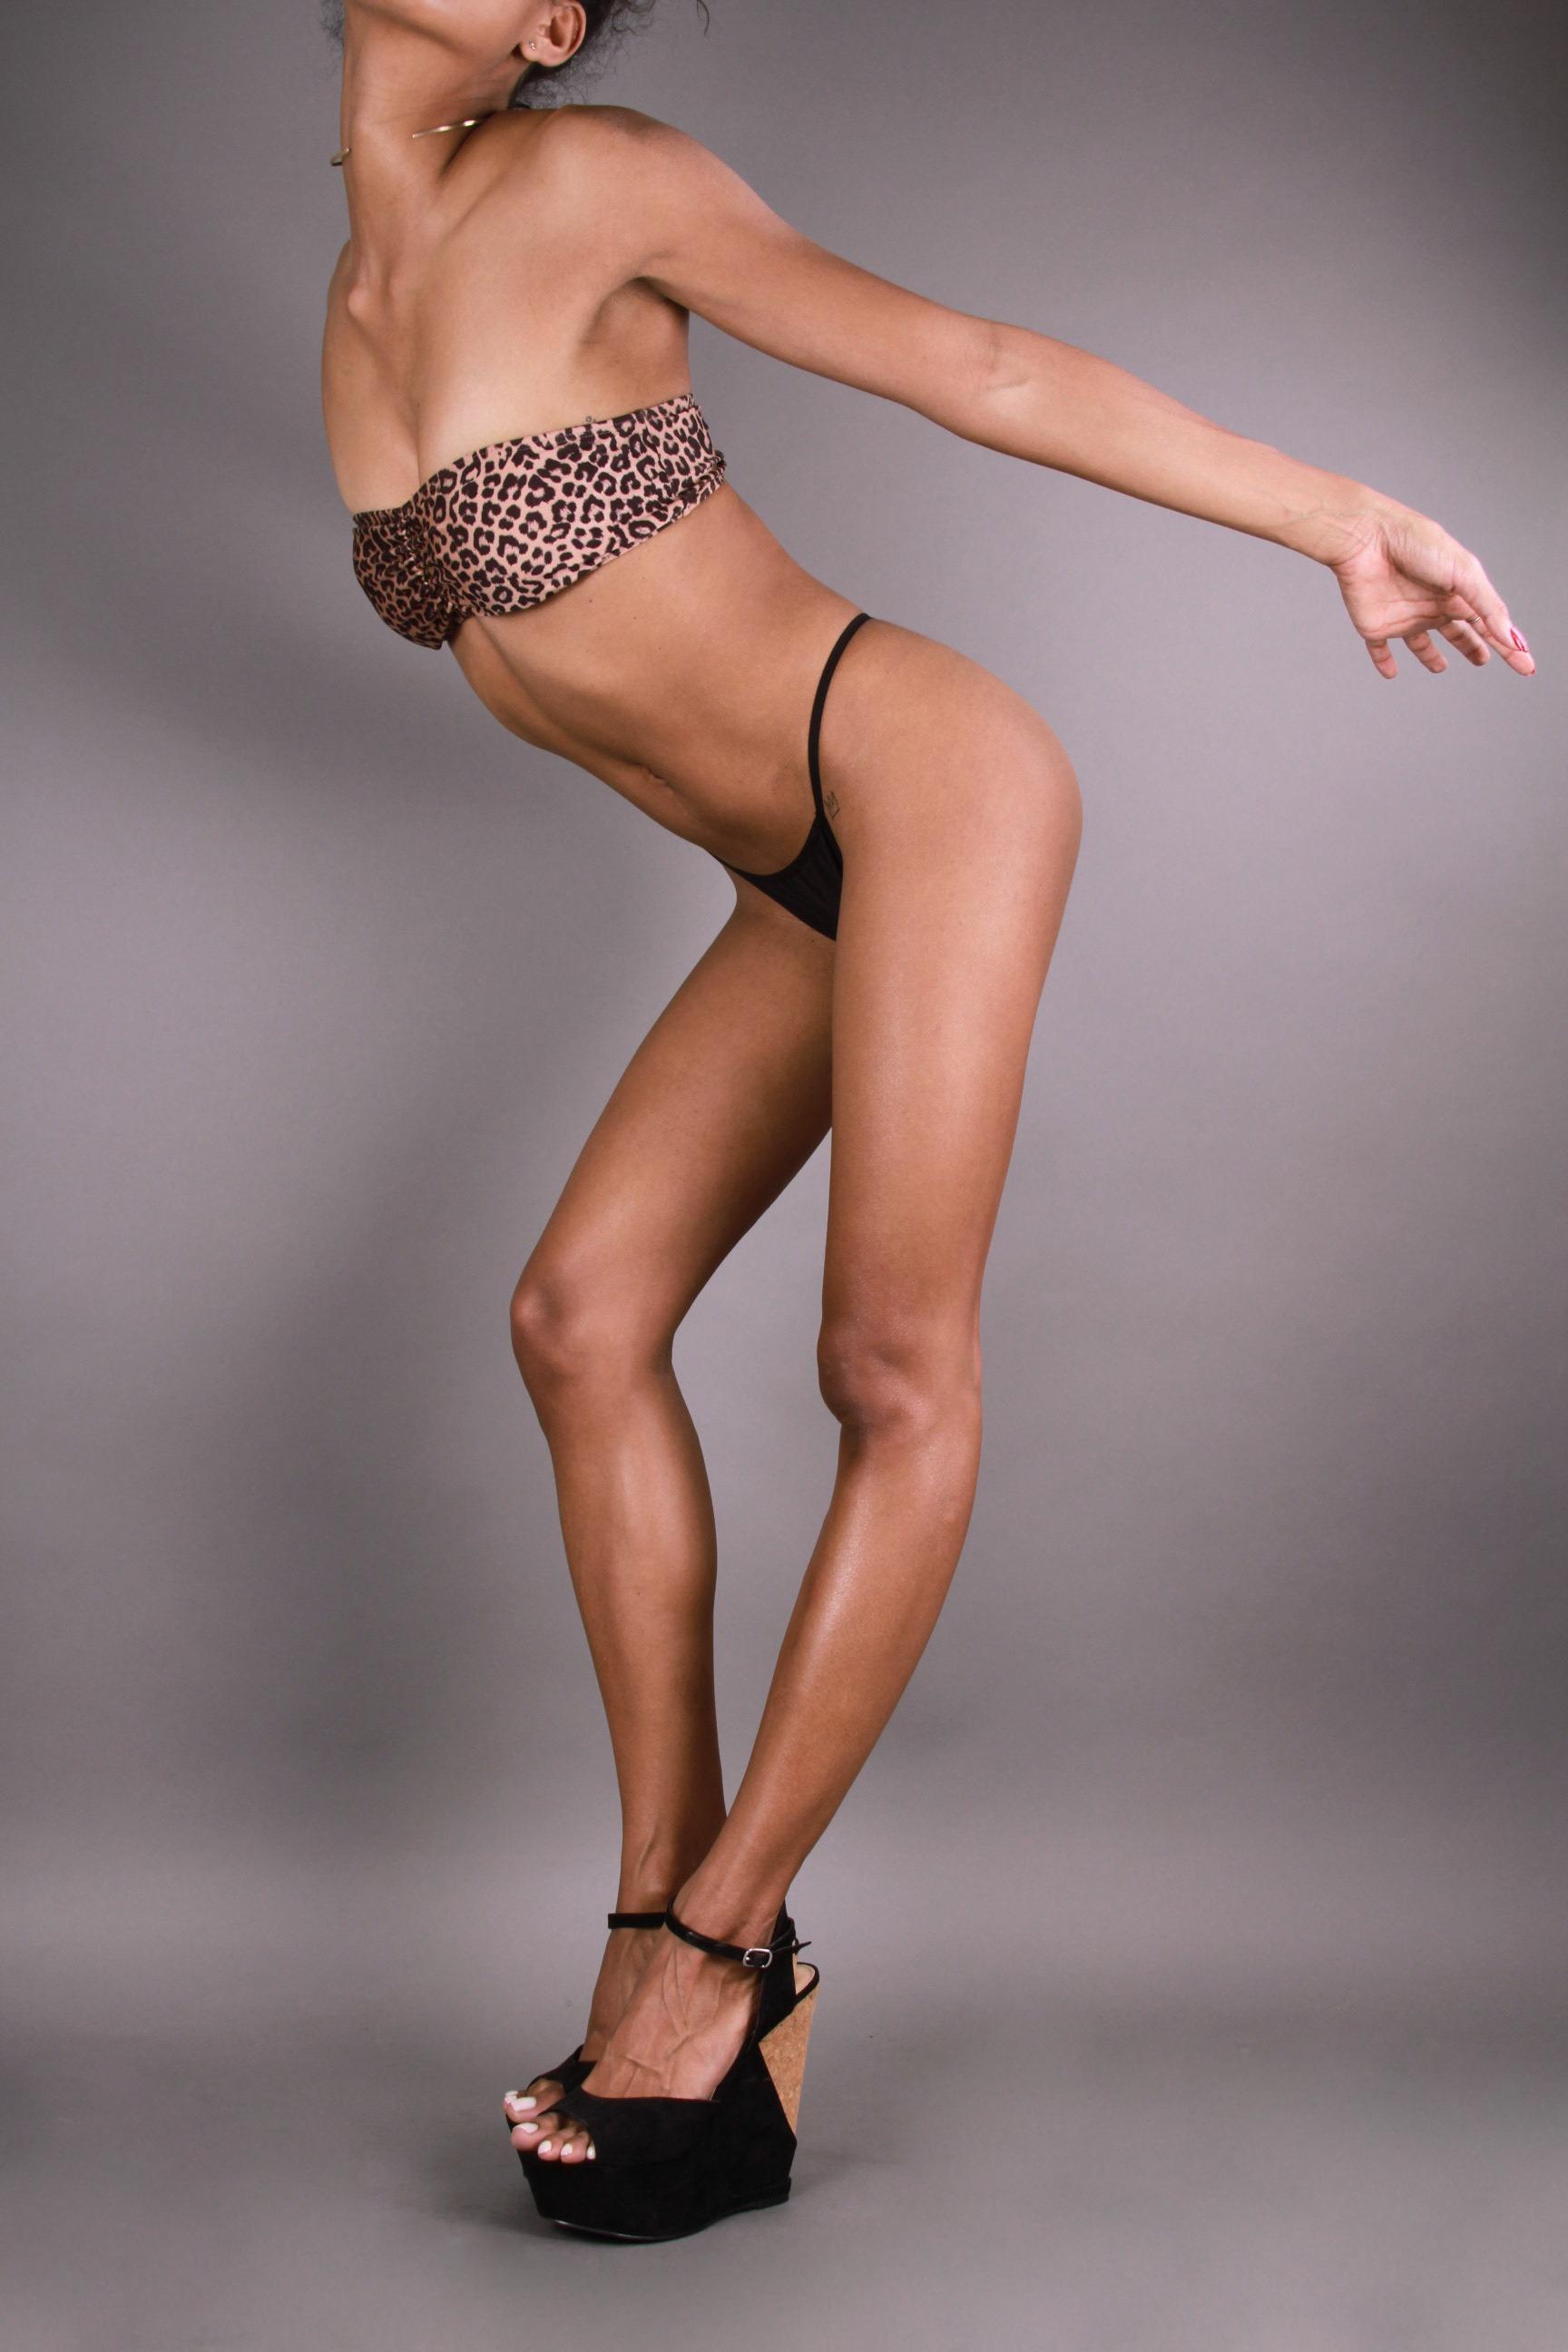 Elizabeth Grullon_Body Double15